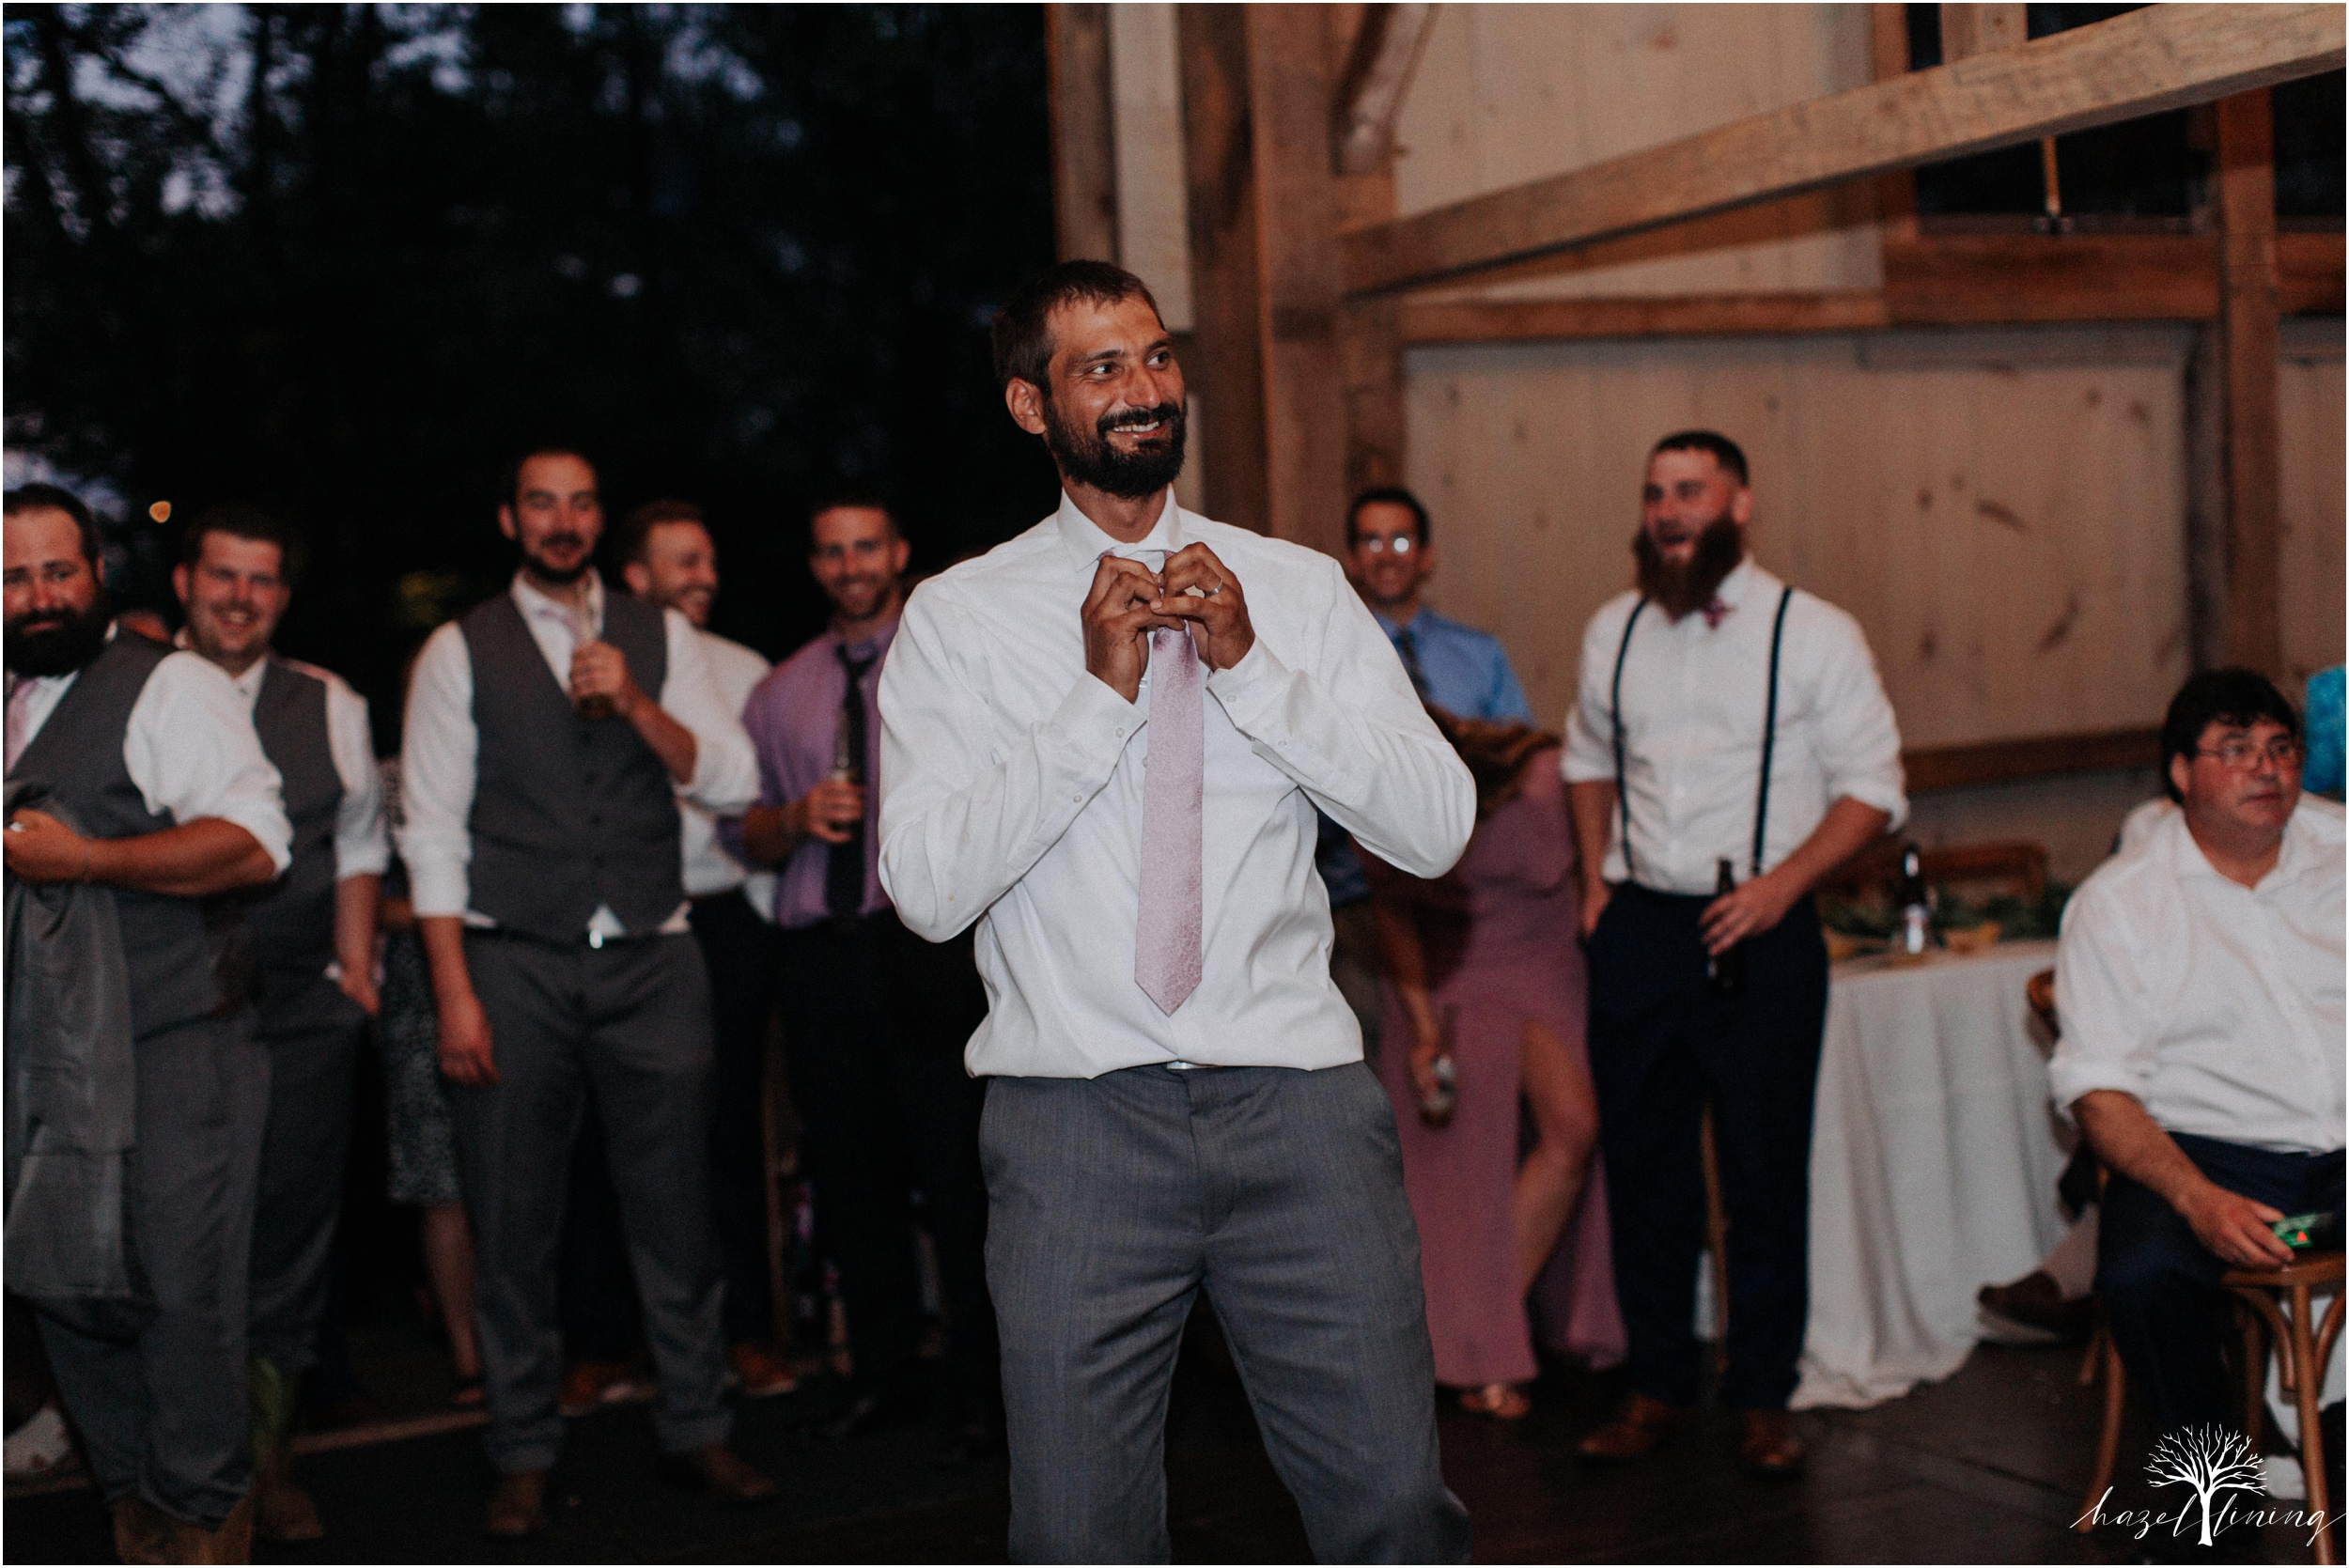 hazel-lining-travel-wedding-elopement-photography-lisa-landon-shoemaker-the-farm-bakery-and-events-bucks-county-quakertown-pennsylvania-summer-country-outdoor-farm-wedding_0165.jpg